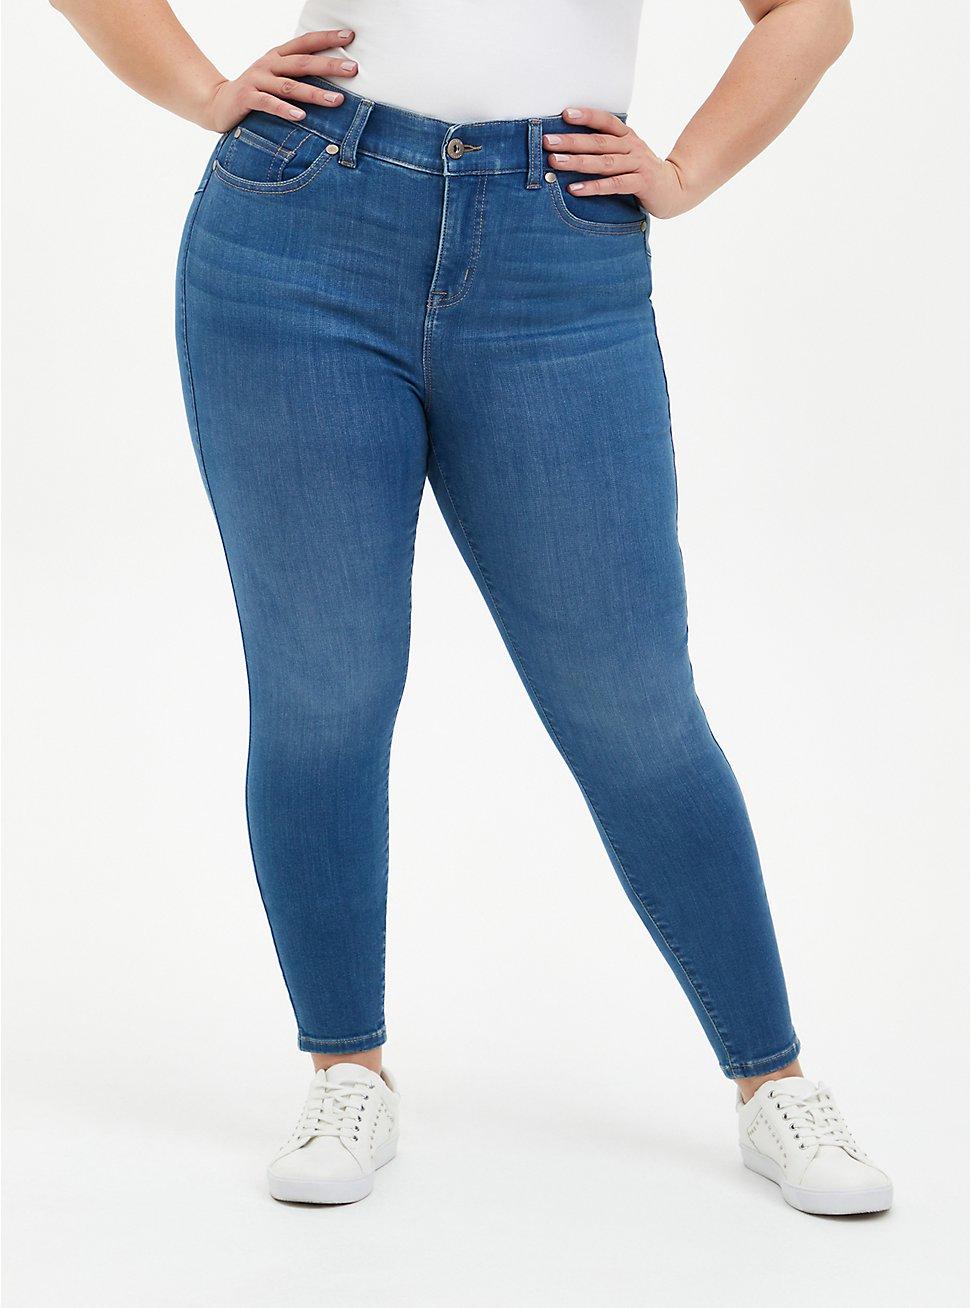 Bombshell Skinny Jean - Super Soft Medium Wash, DISCO FEVER, hi-res